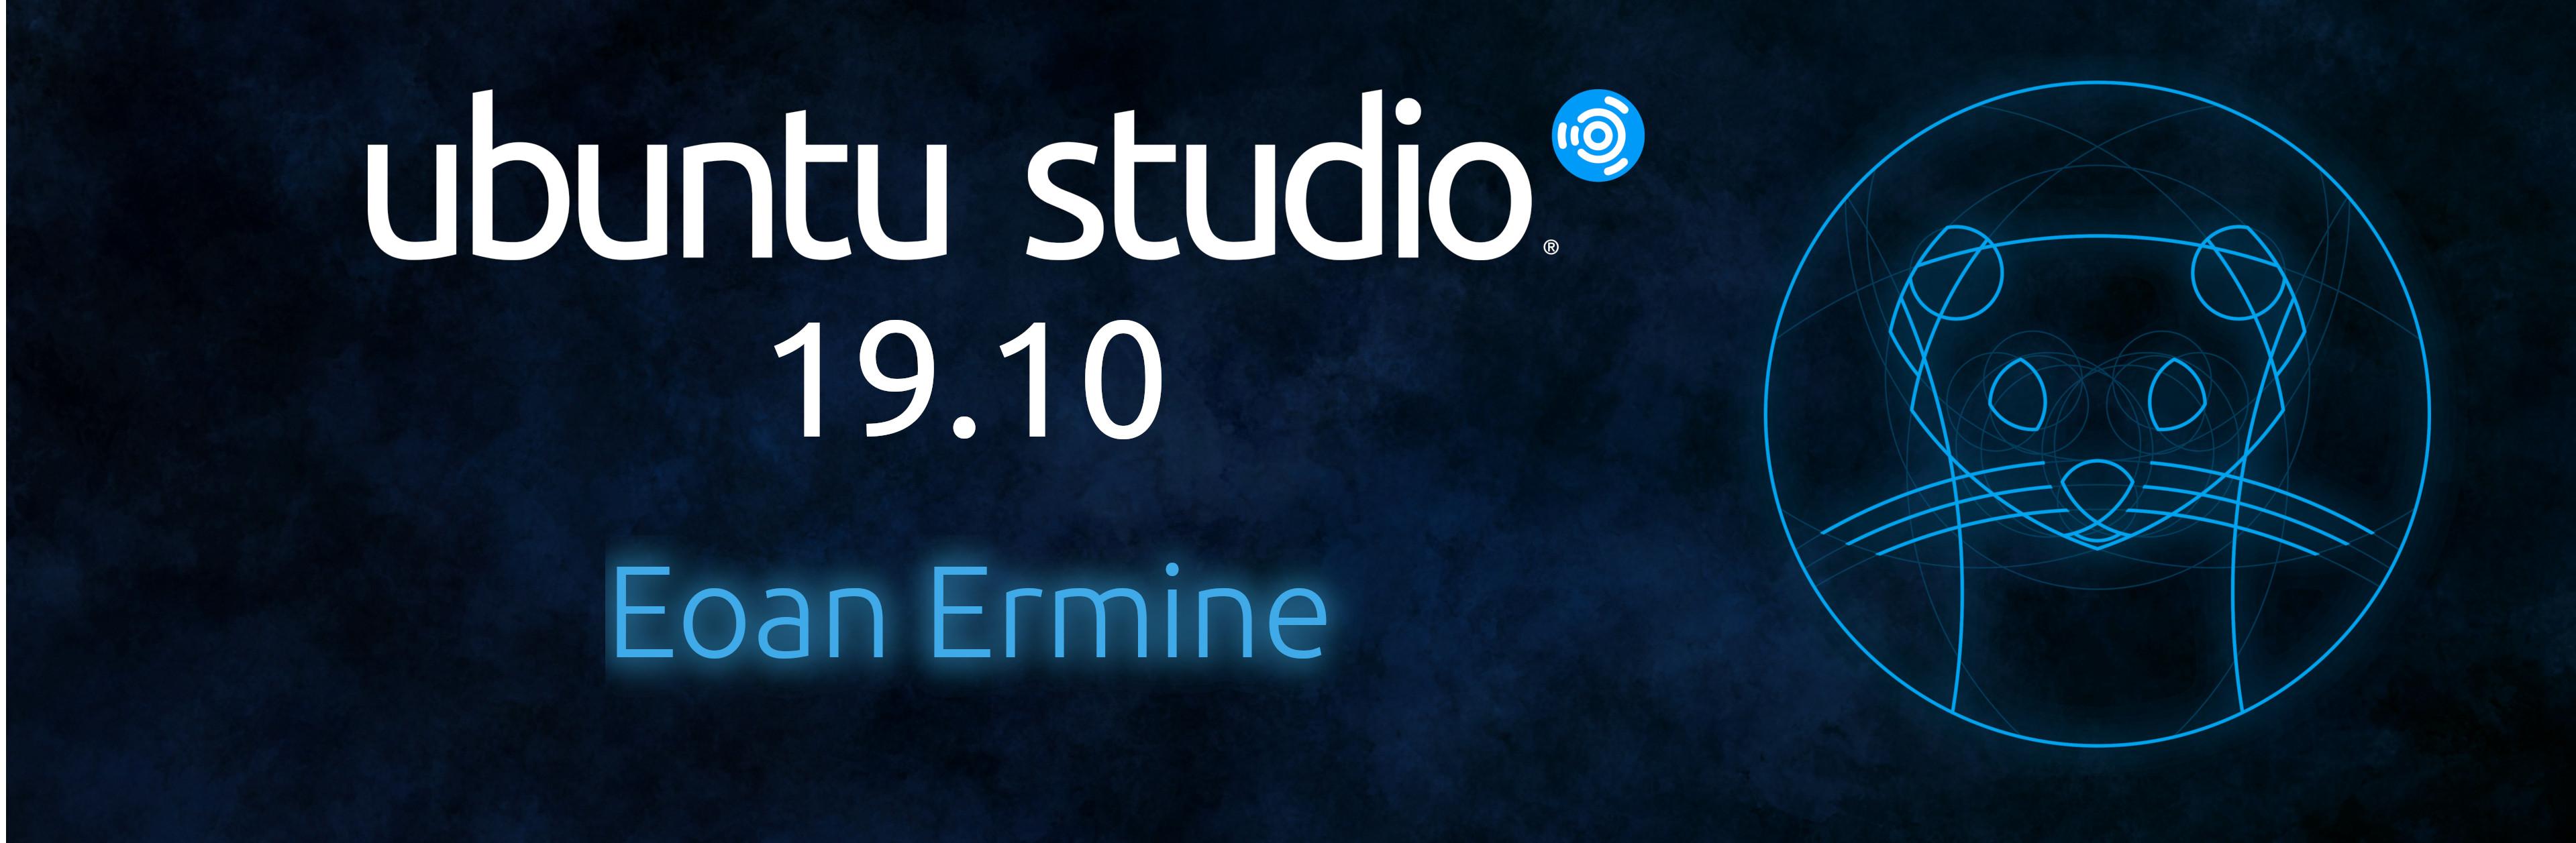 UBUNTU STUDIO 9.10 TÉLÉCHARGER